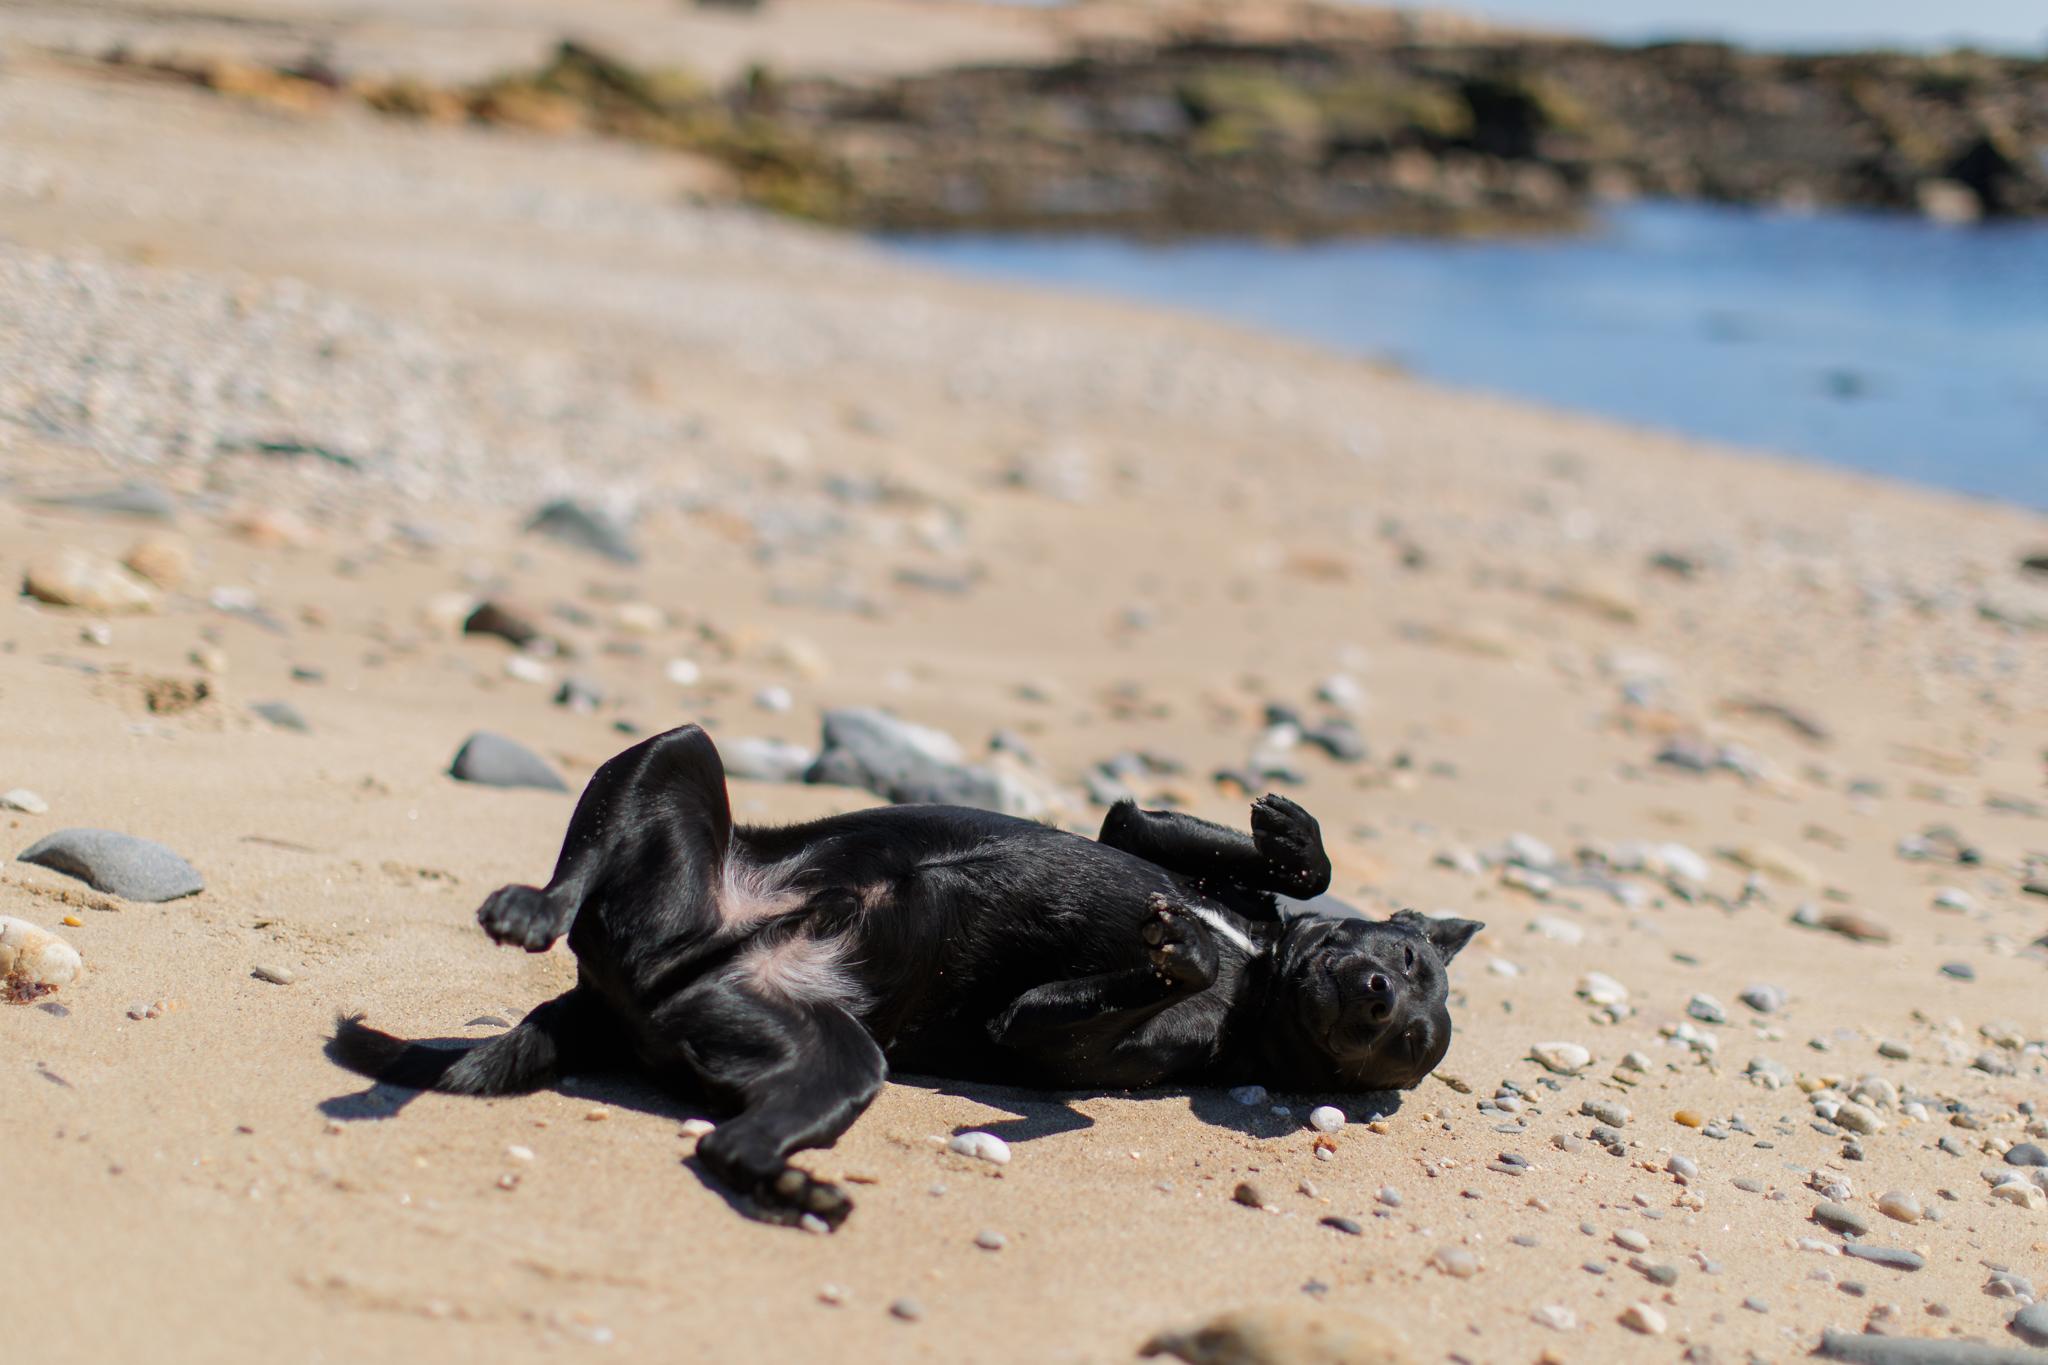 dog rolling on beach in Narragansett, RI